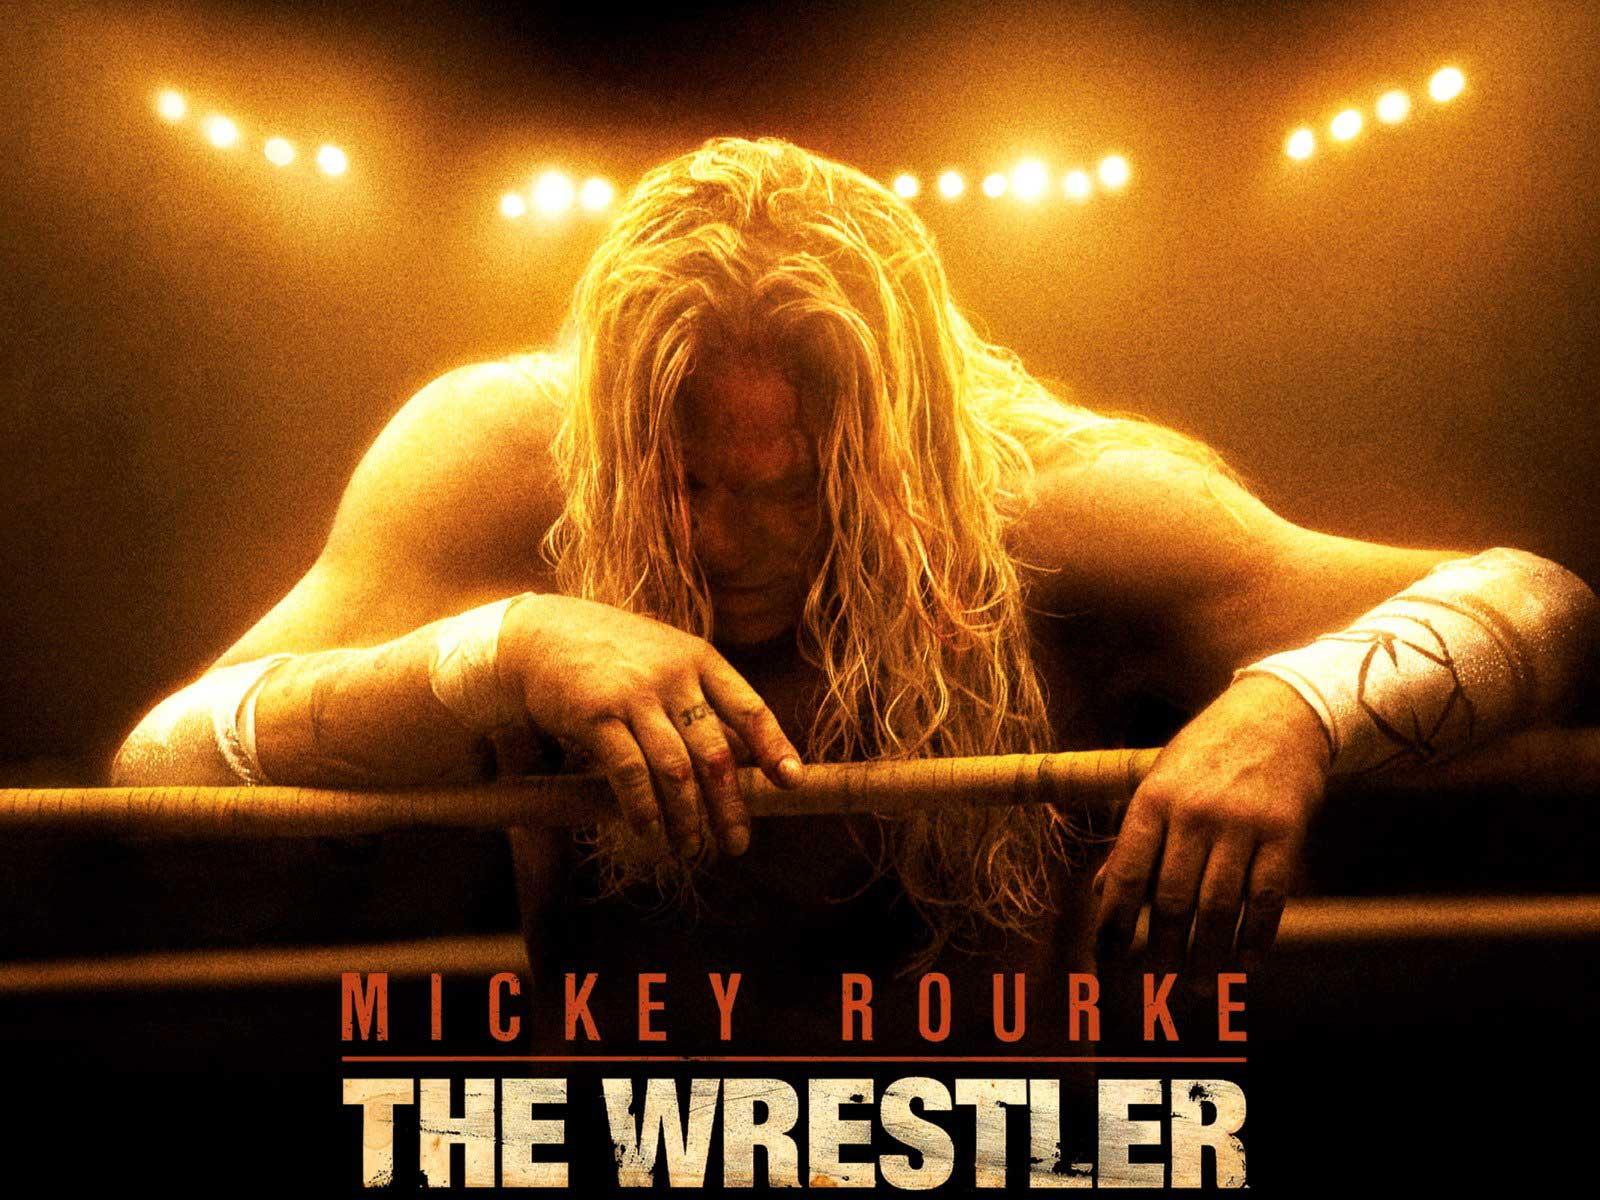 The Wrestler - Producers: Darren Aronofsky, Scott Franklin